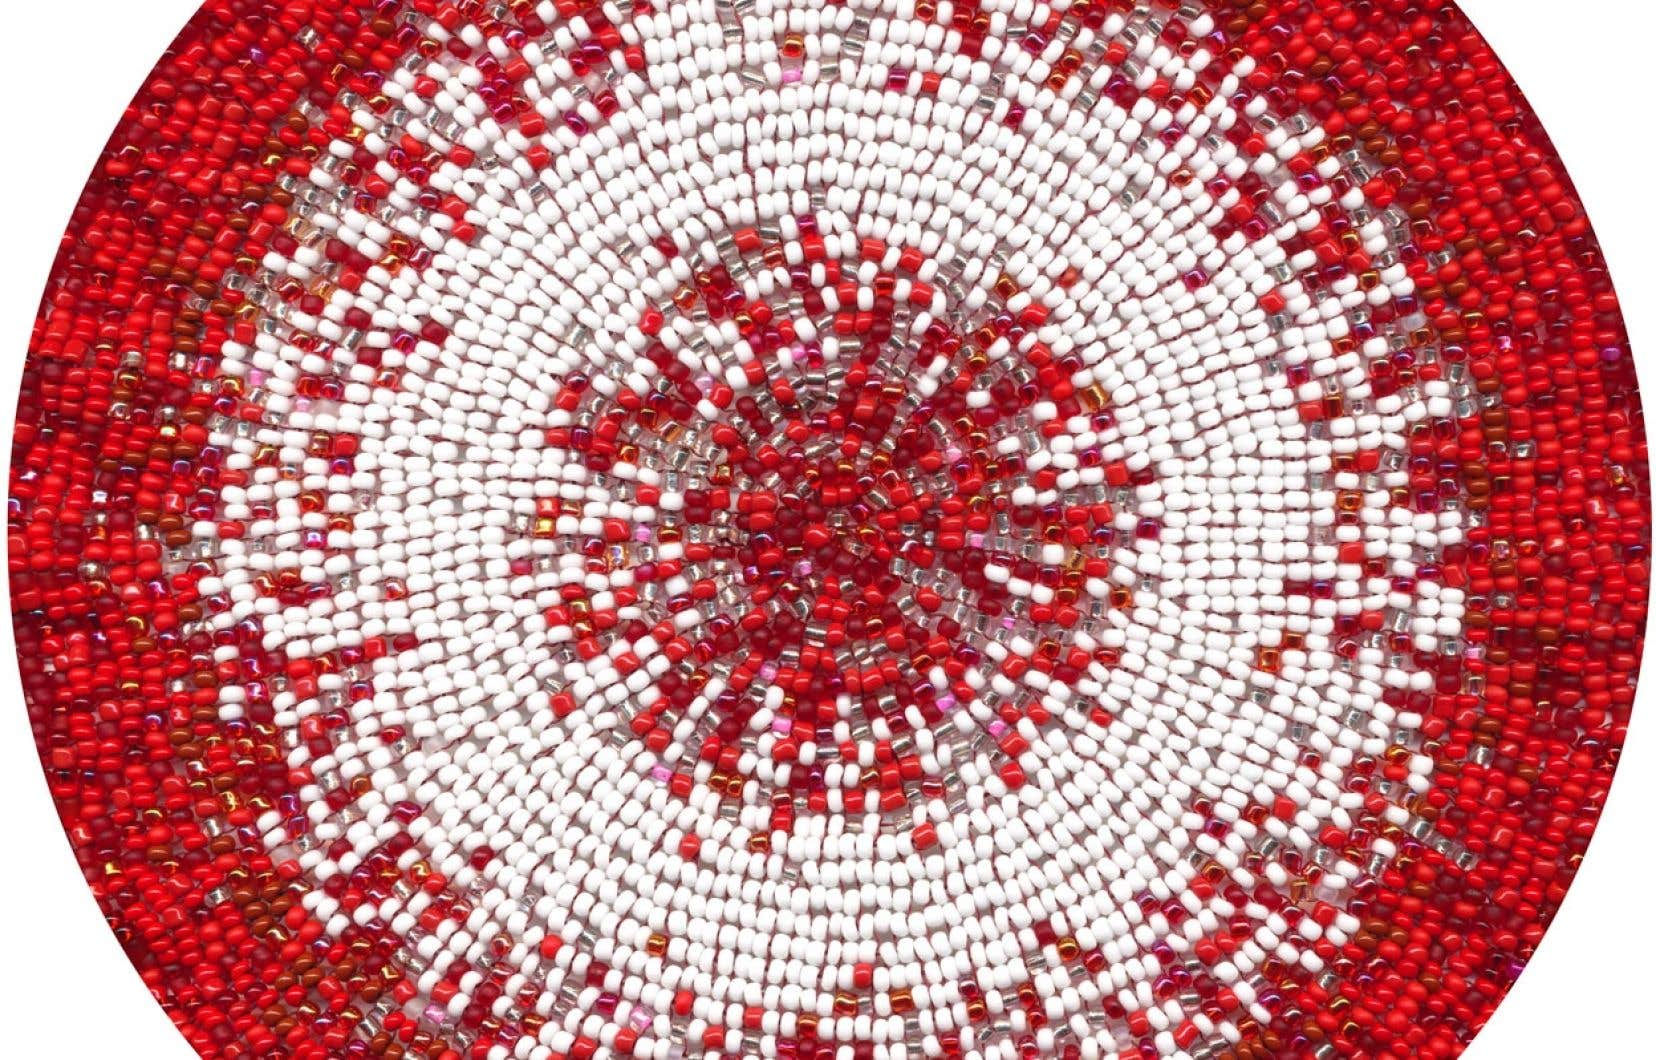 Meditations on Red # 1 (2013), de l'artiste Nadia Myre